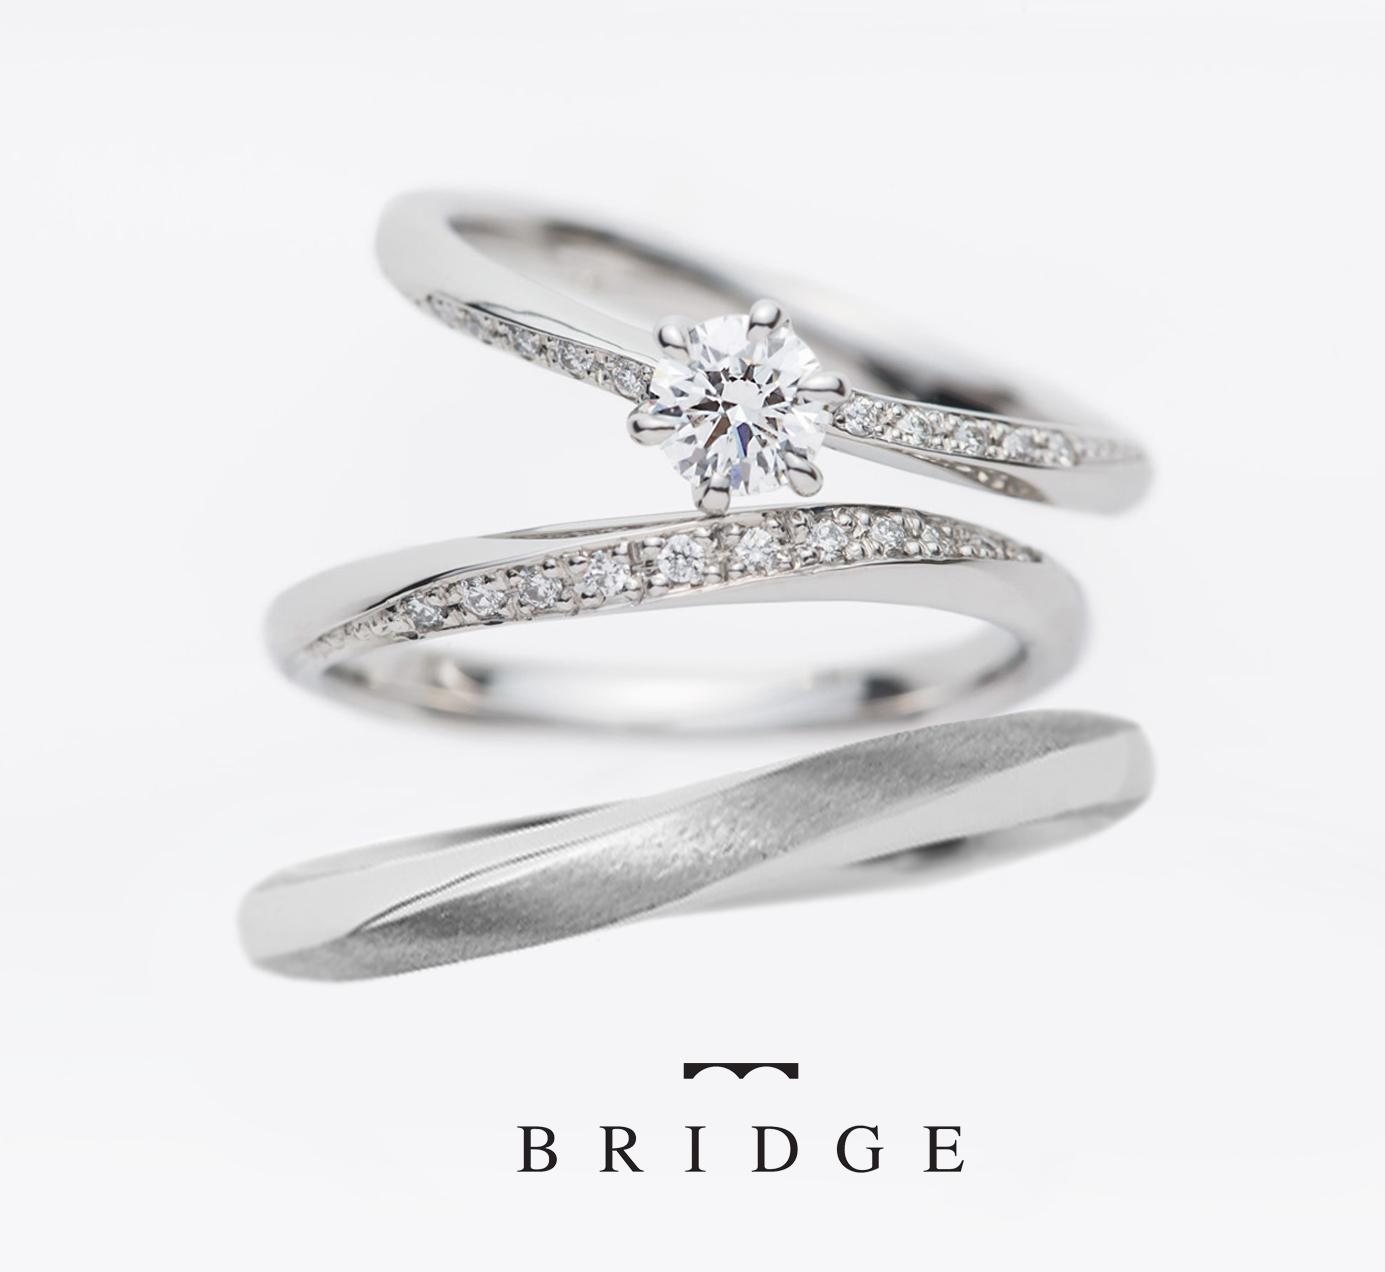 BRIDGE銀座がおすすめする春にピッタリのダイヤモンドラインが美しい大人可愛い婚約指輪と結婚指輪